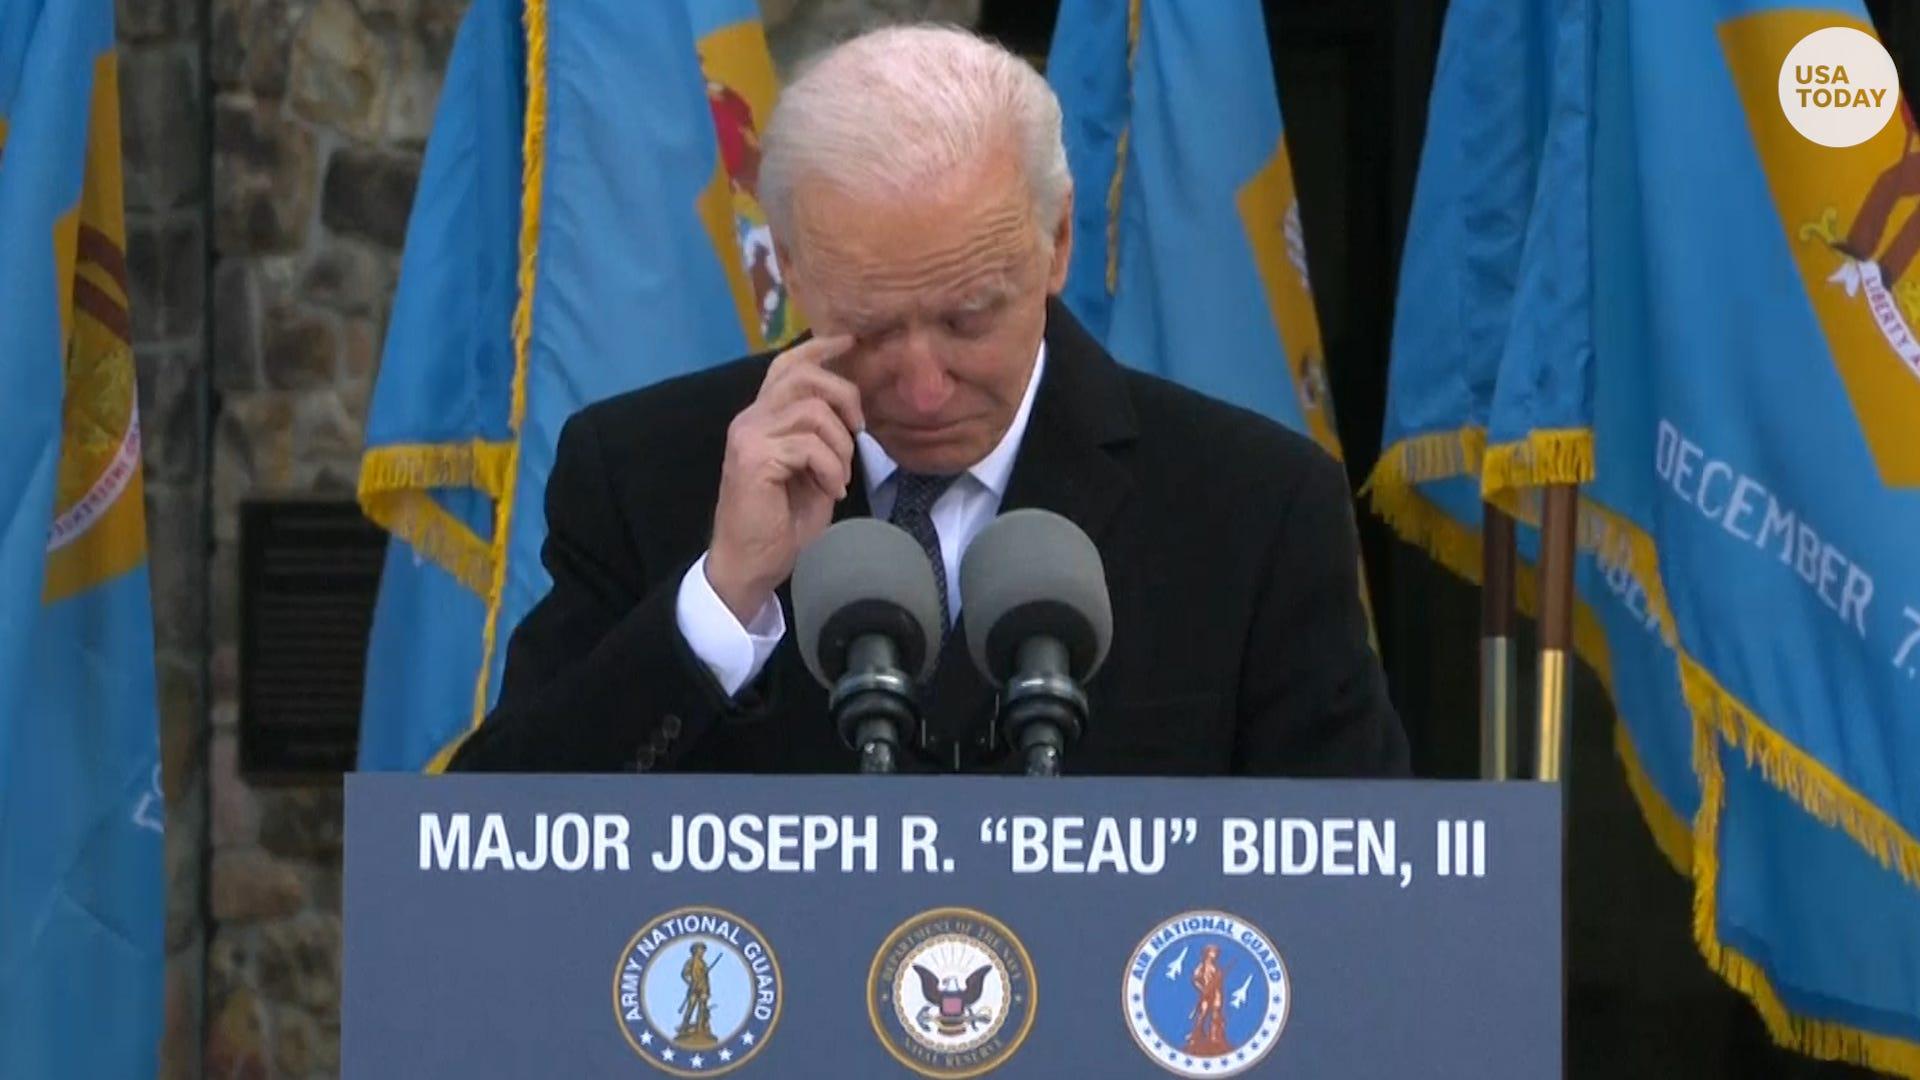 Joe Biden holds back tears as he heads to White House for inauguration